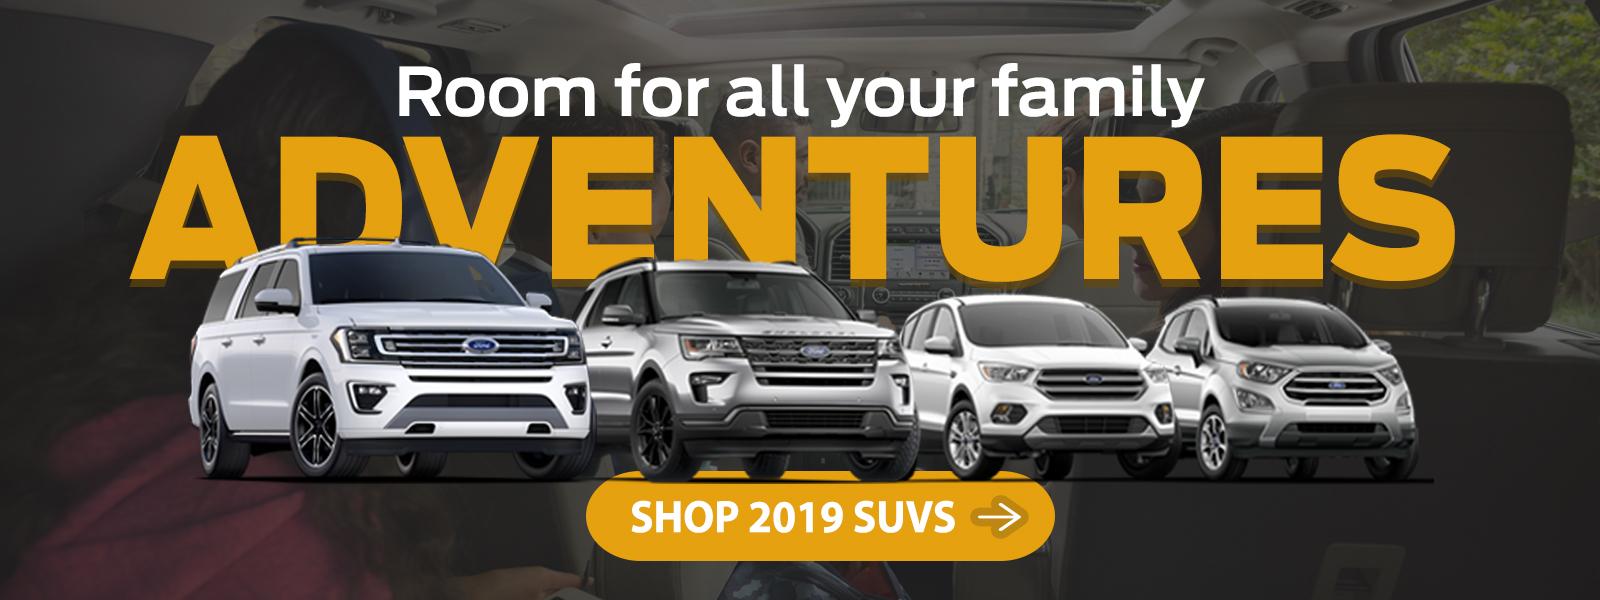 Hacienda Ford Edinburg >> Hacienda Ford: New & Used Ford Dealership Edinburg